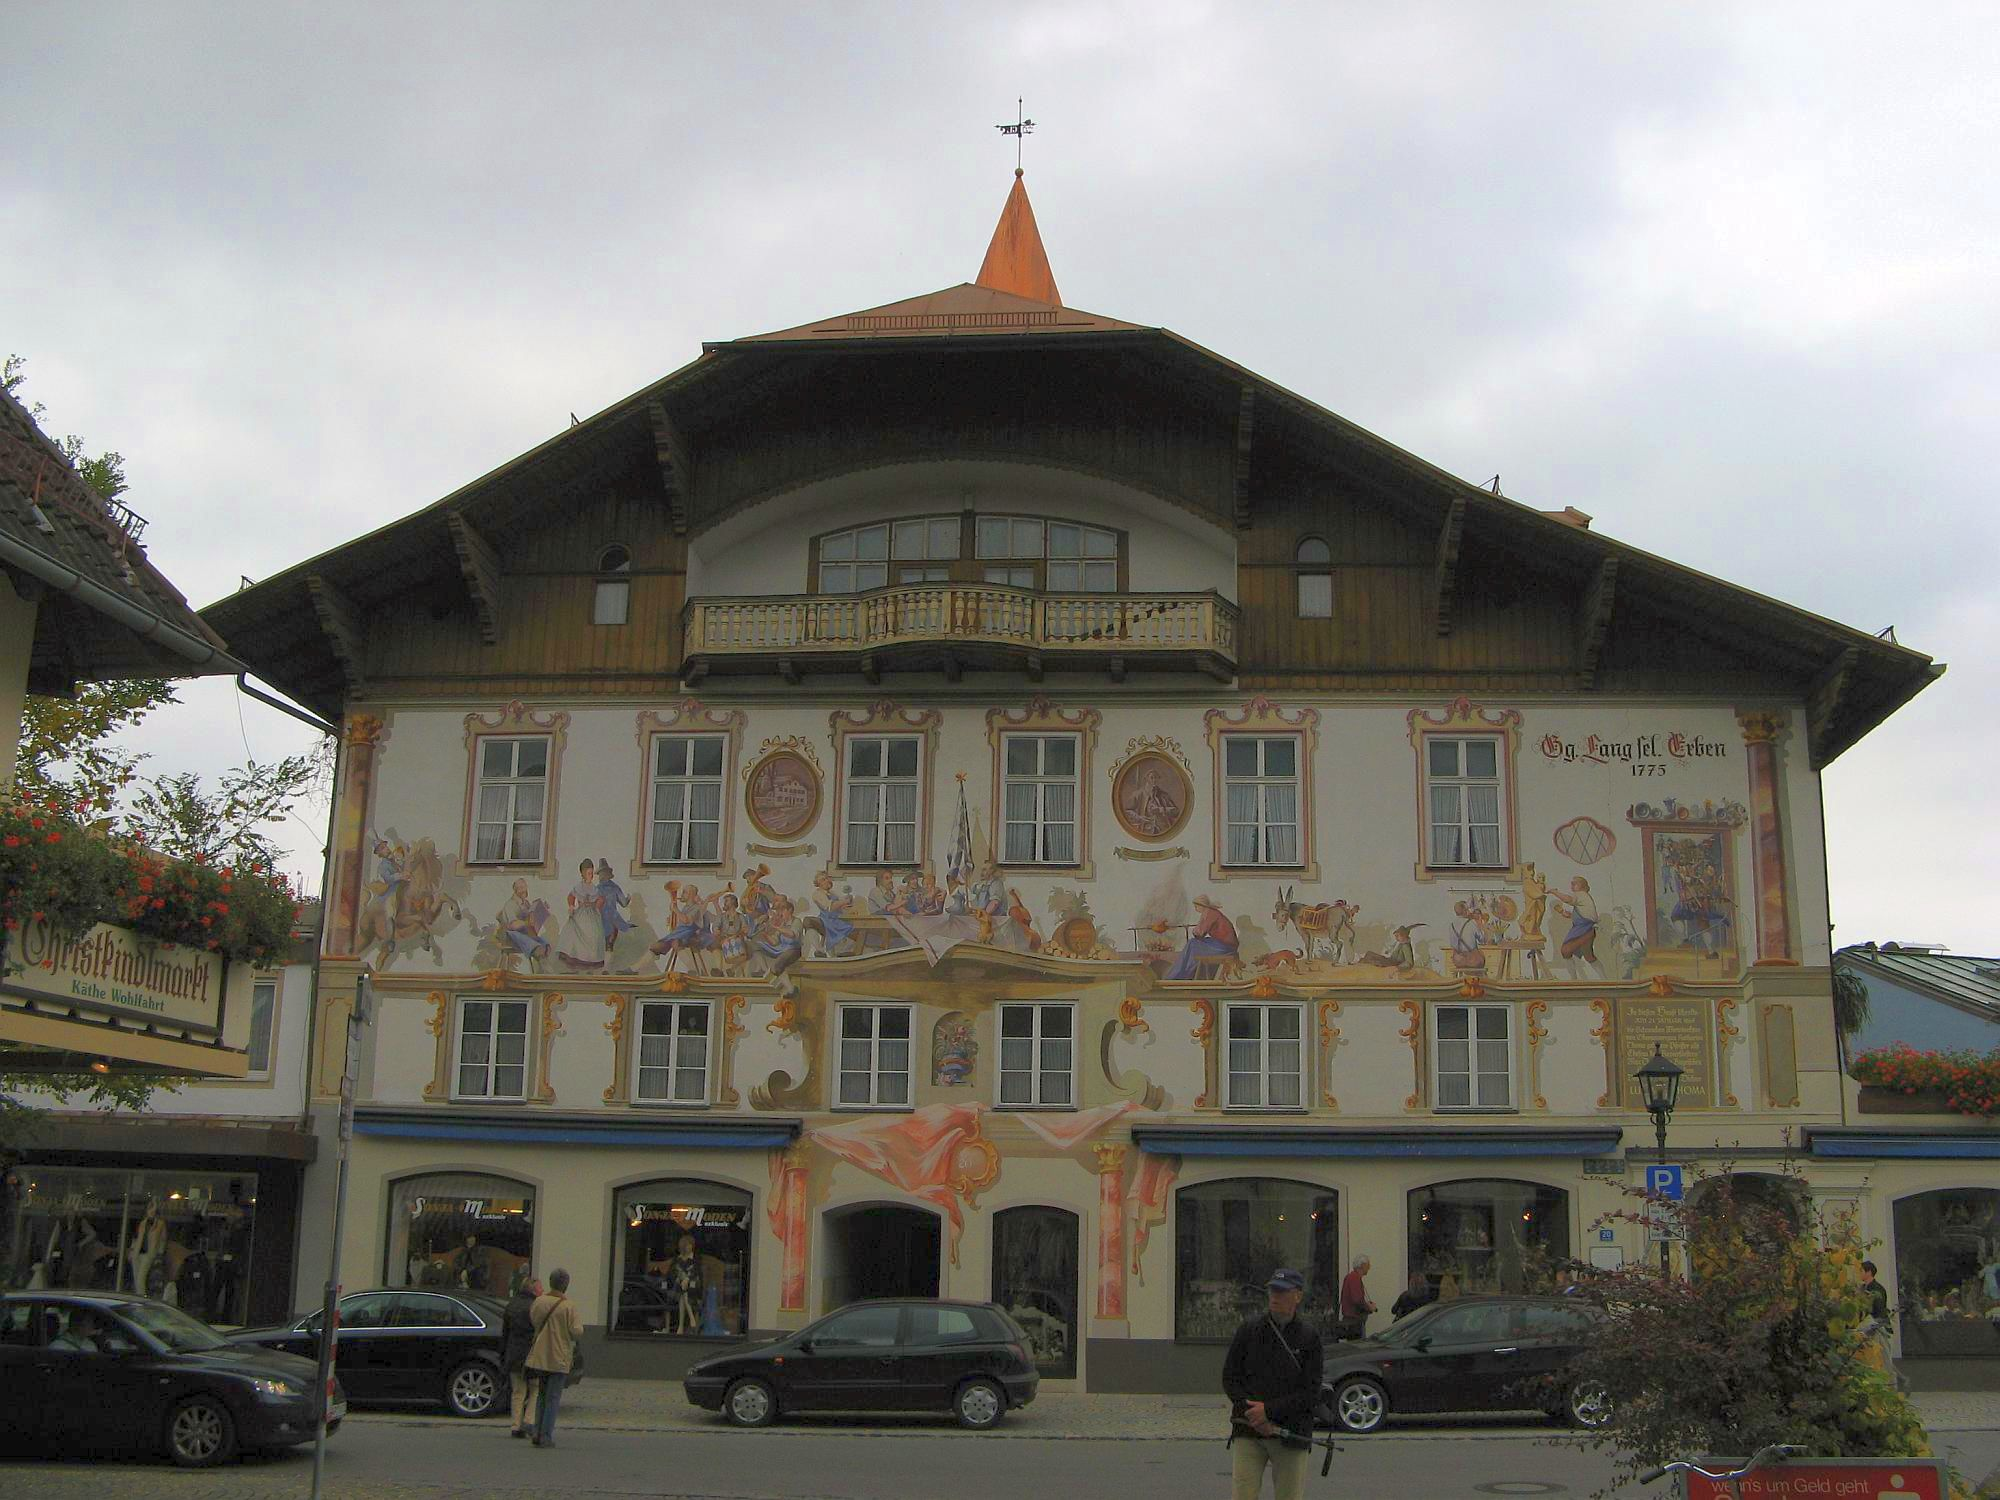 File:Oberammergau - Geburtshaus Ludwig Thoma.jpg - Wikimedia Commons